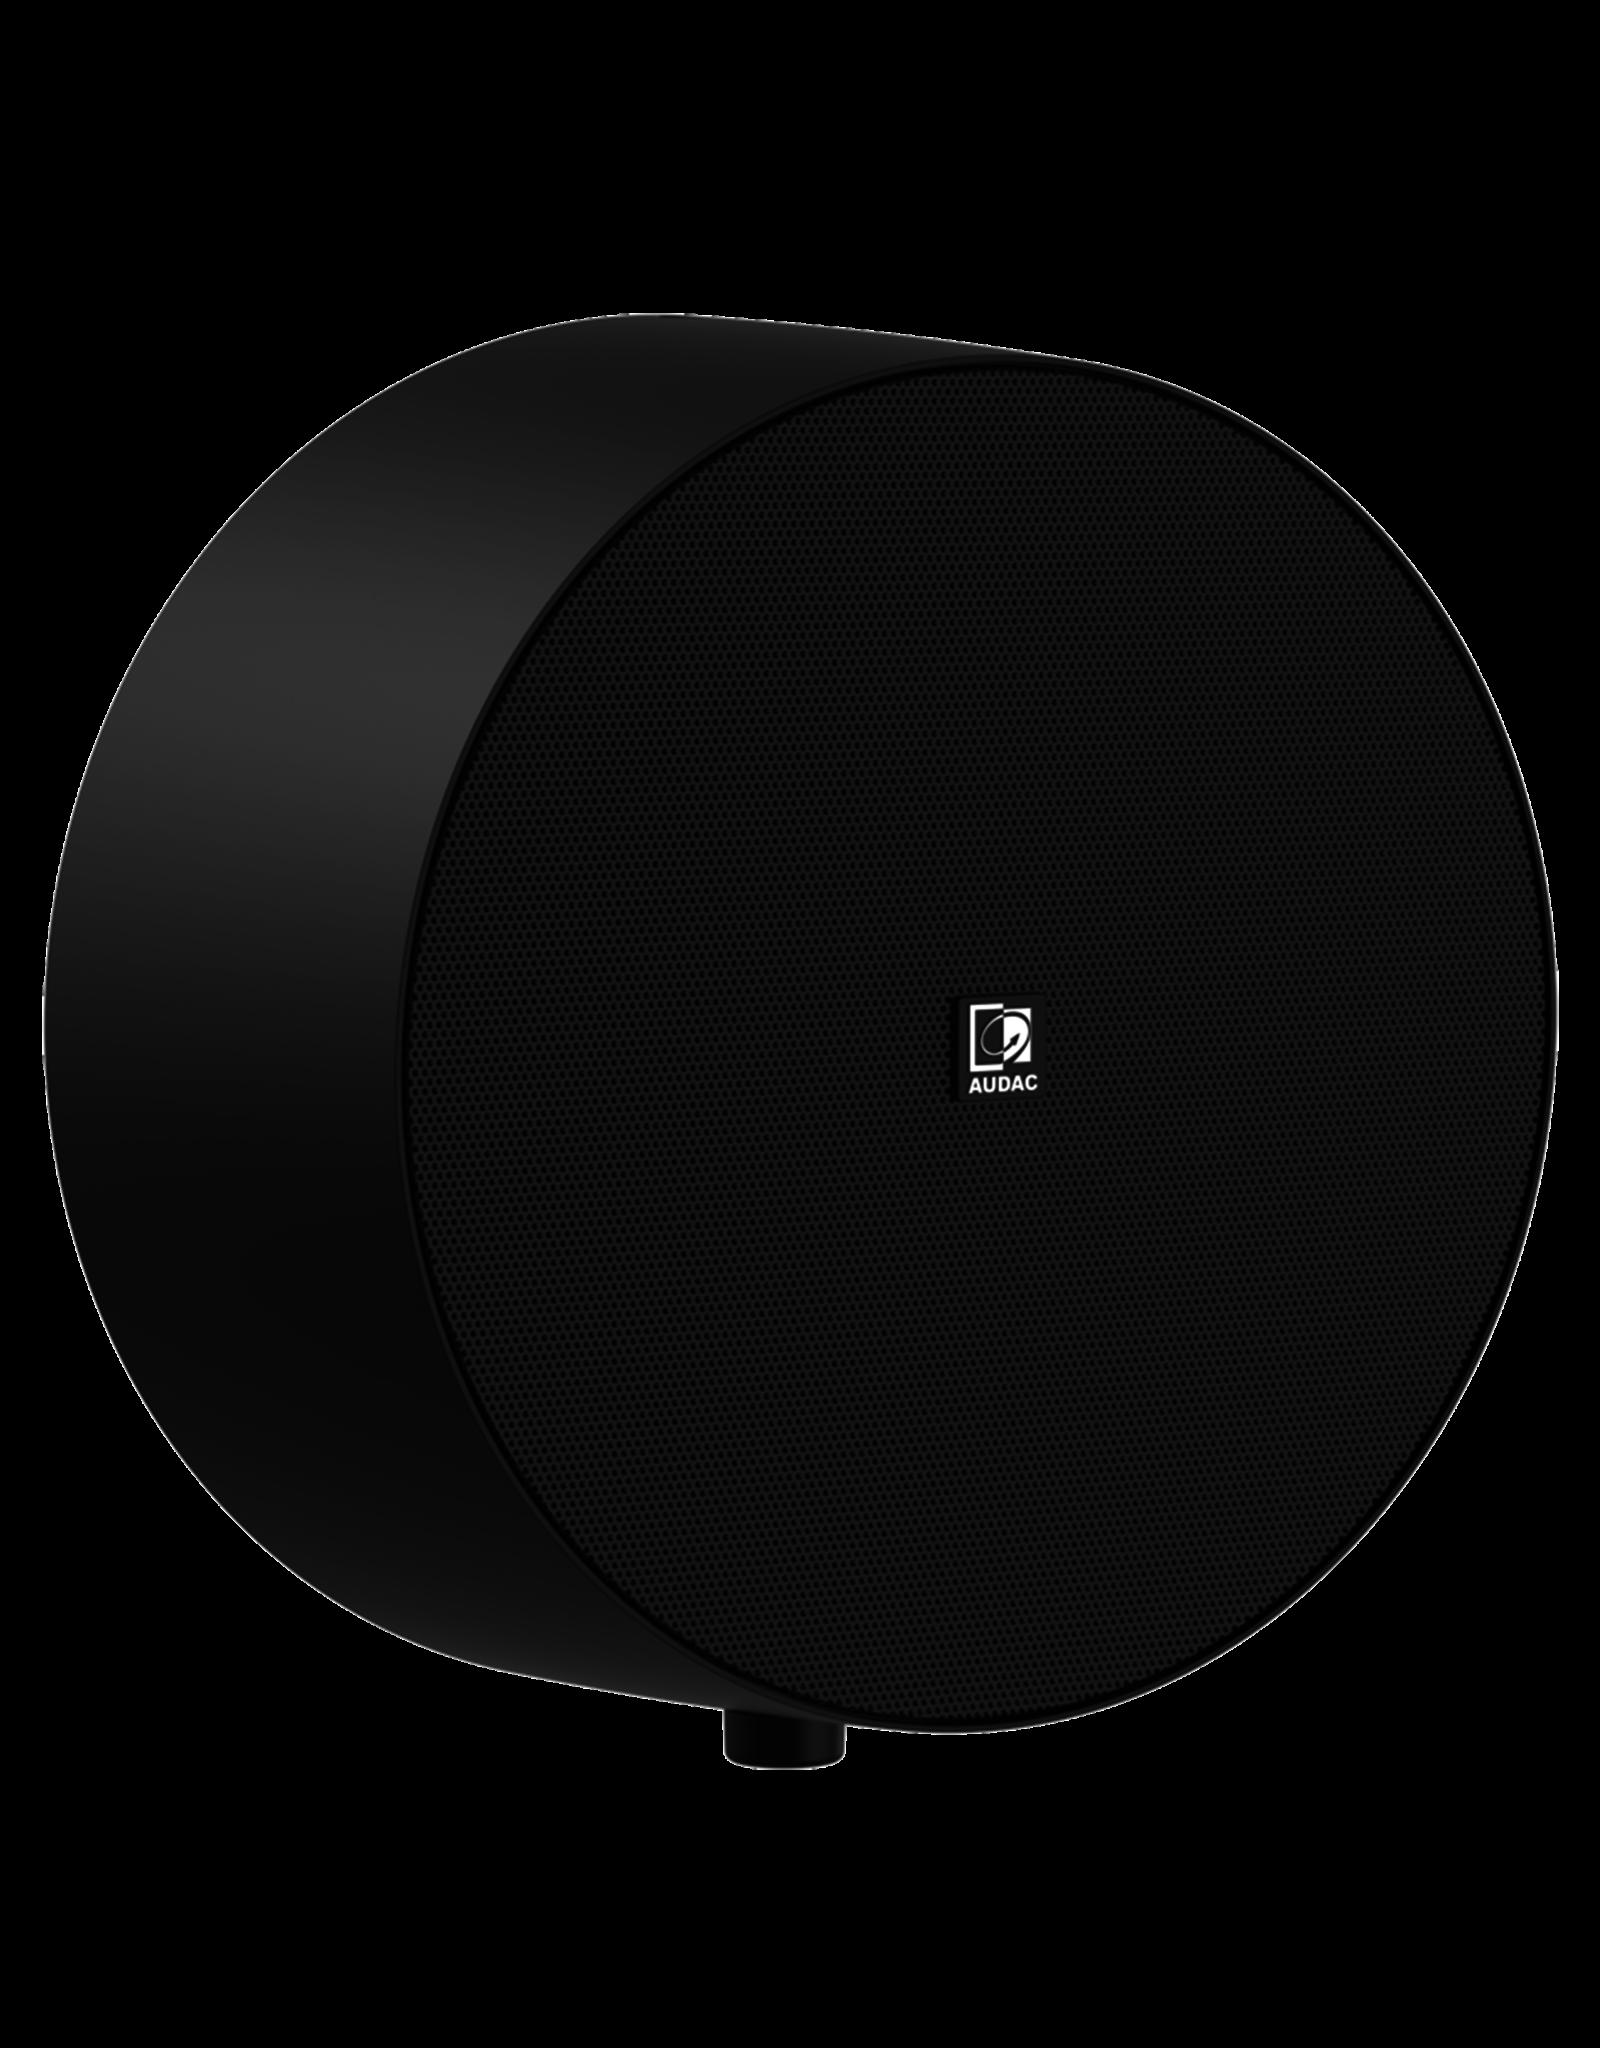 Audac Surface mount speaker Black version with volume controller